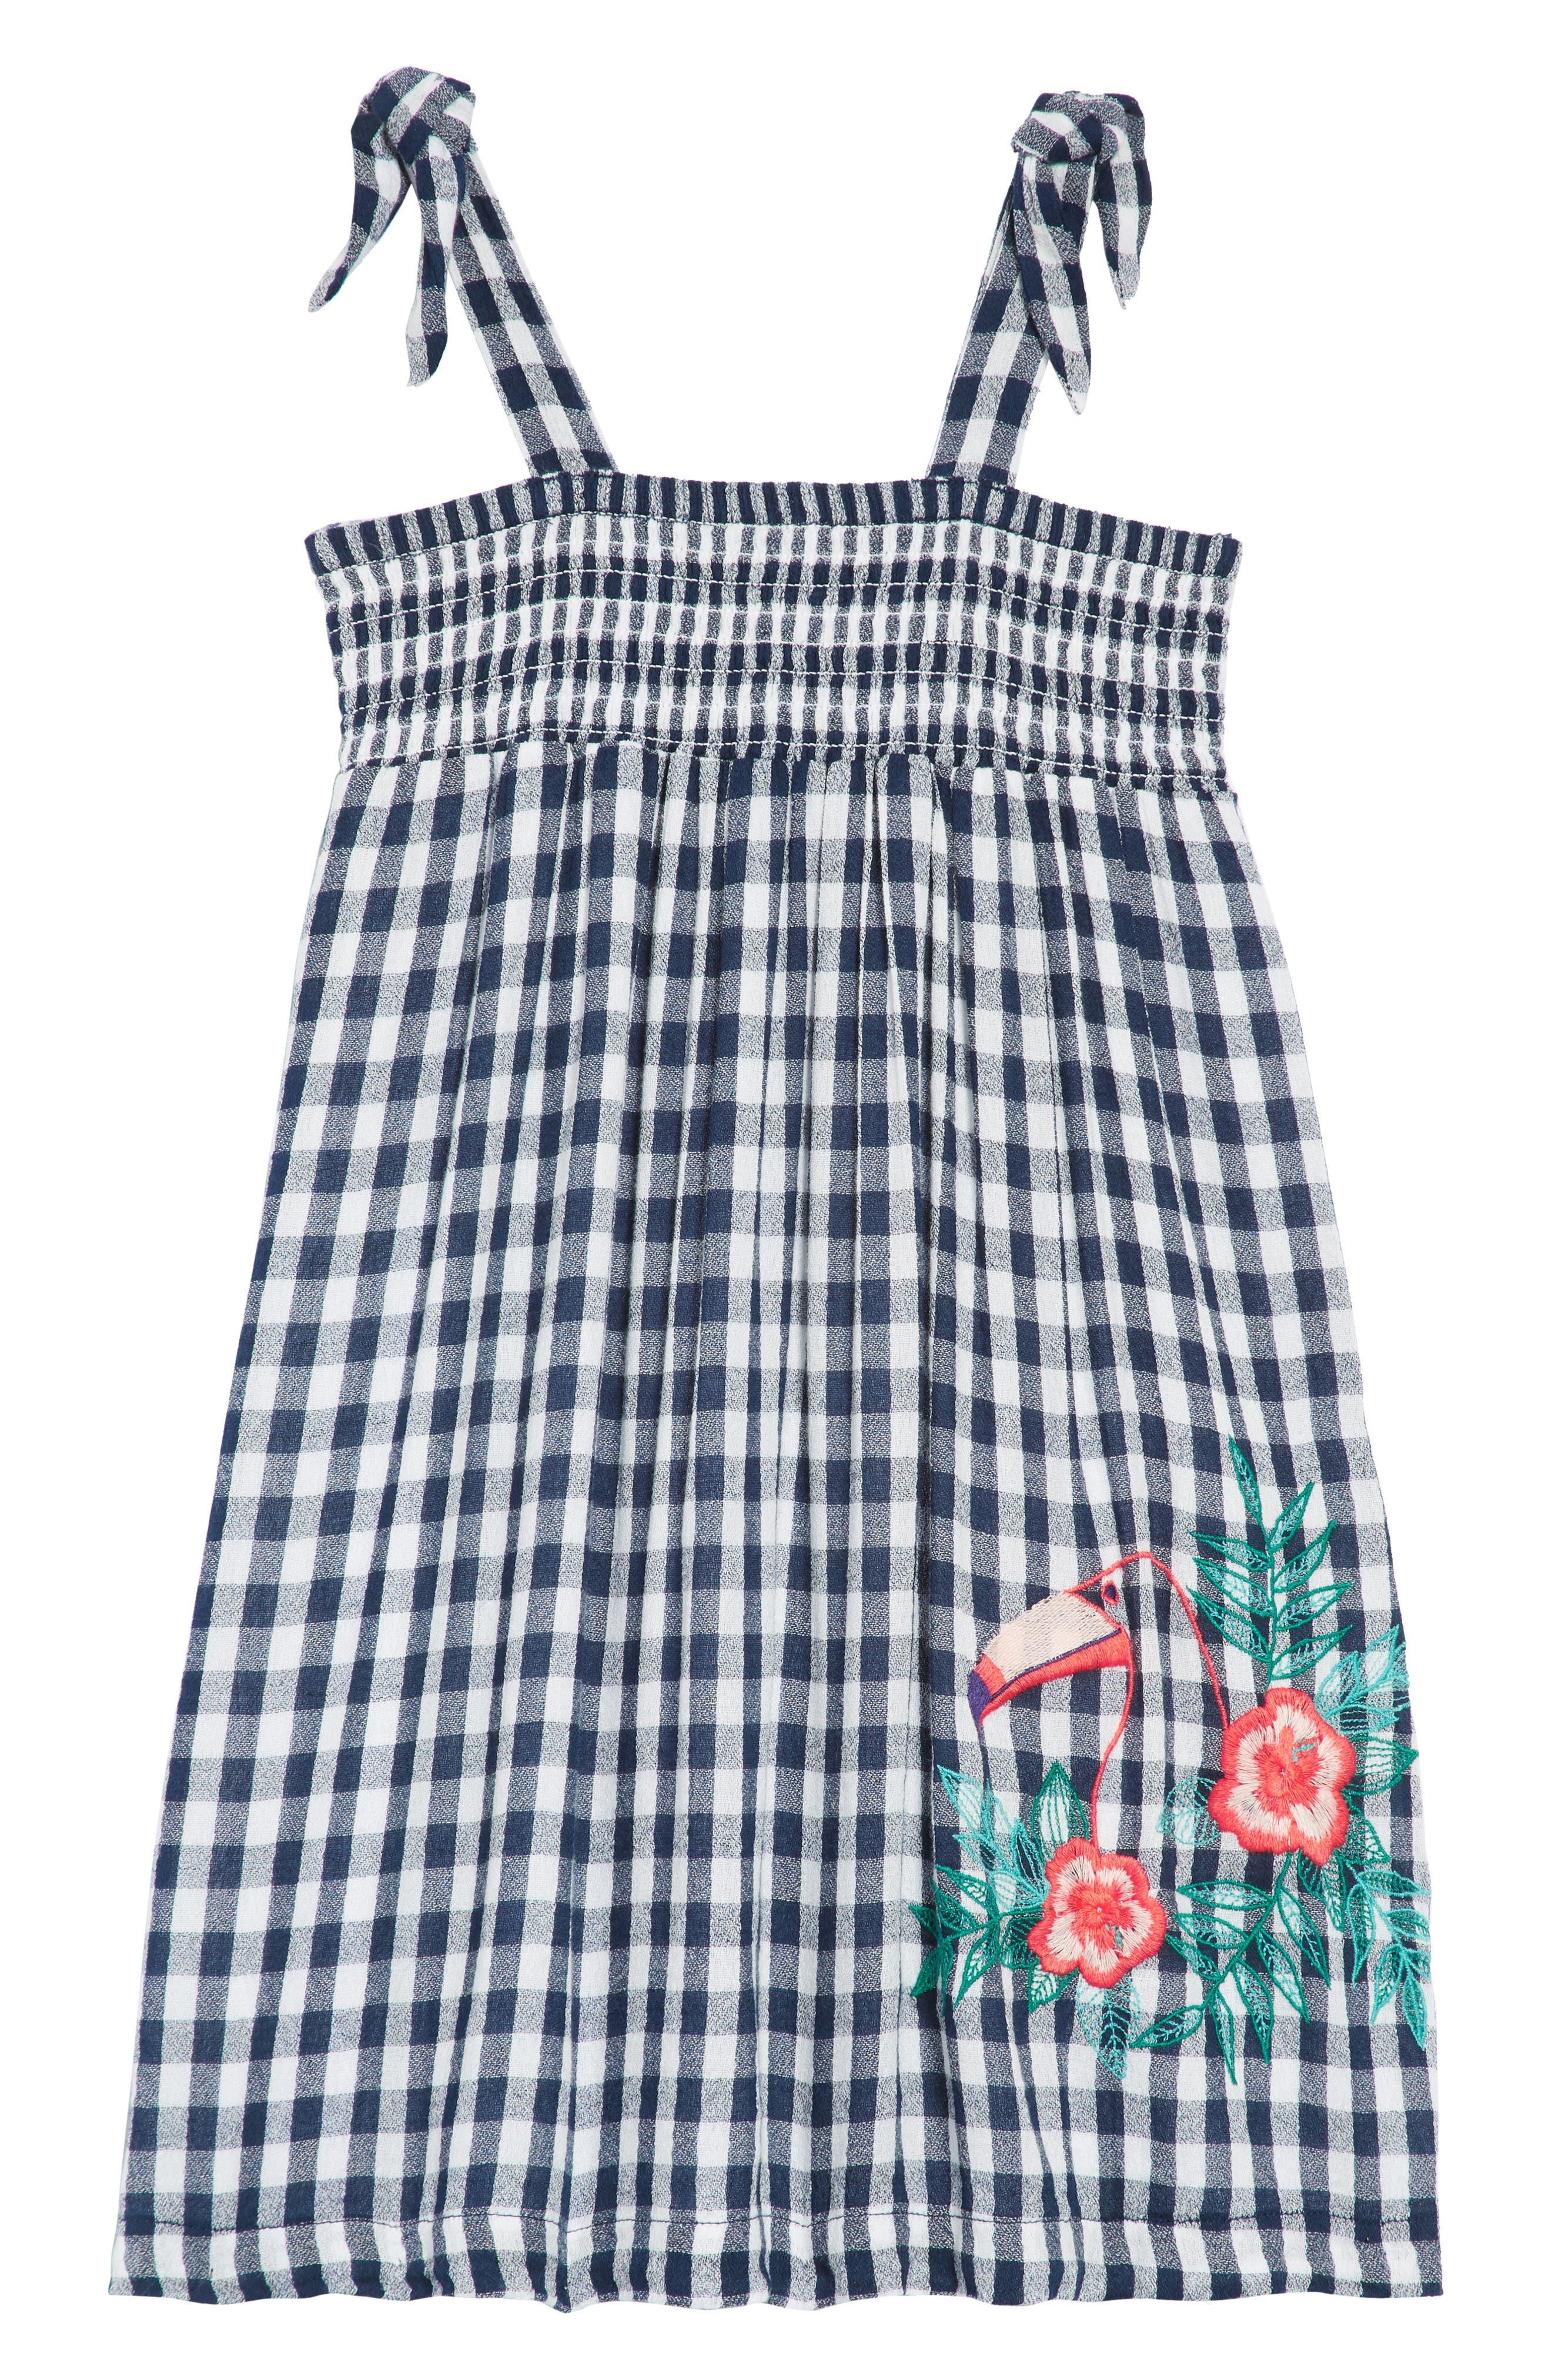 TUCKER + TATE Smocked Gingham Dress, Main, color, 410